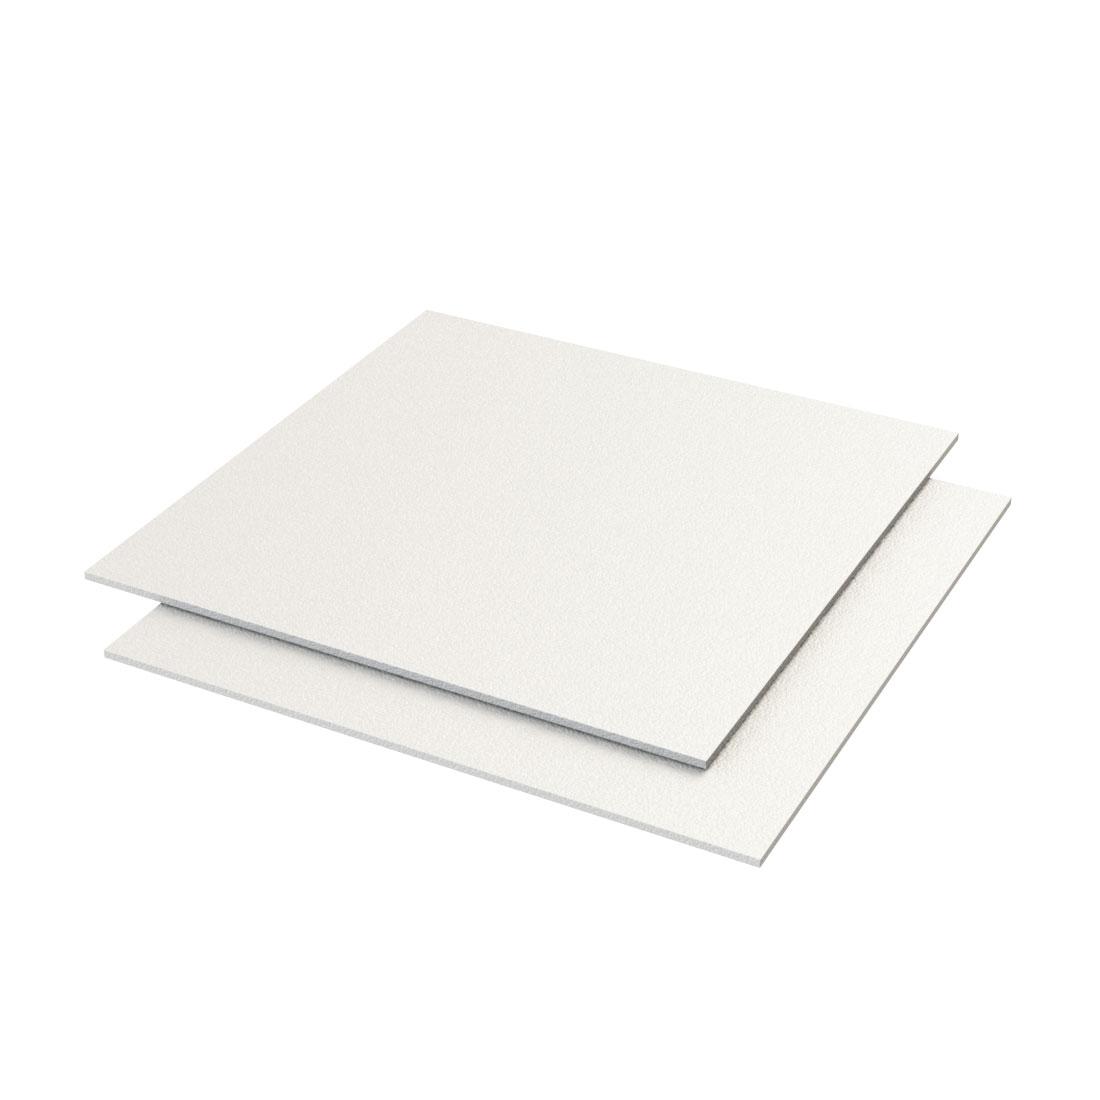 Lexan Cliniwall PC Plaat Off white 86183 3050x1300x1,7mm 463285